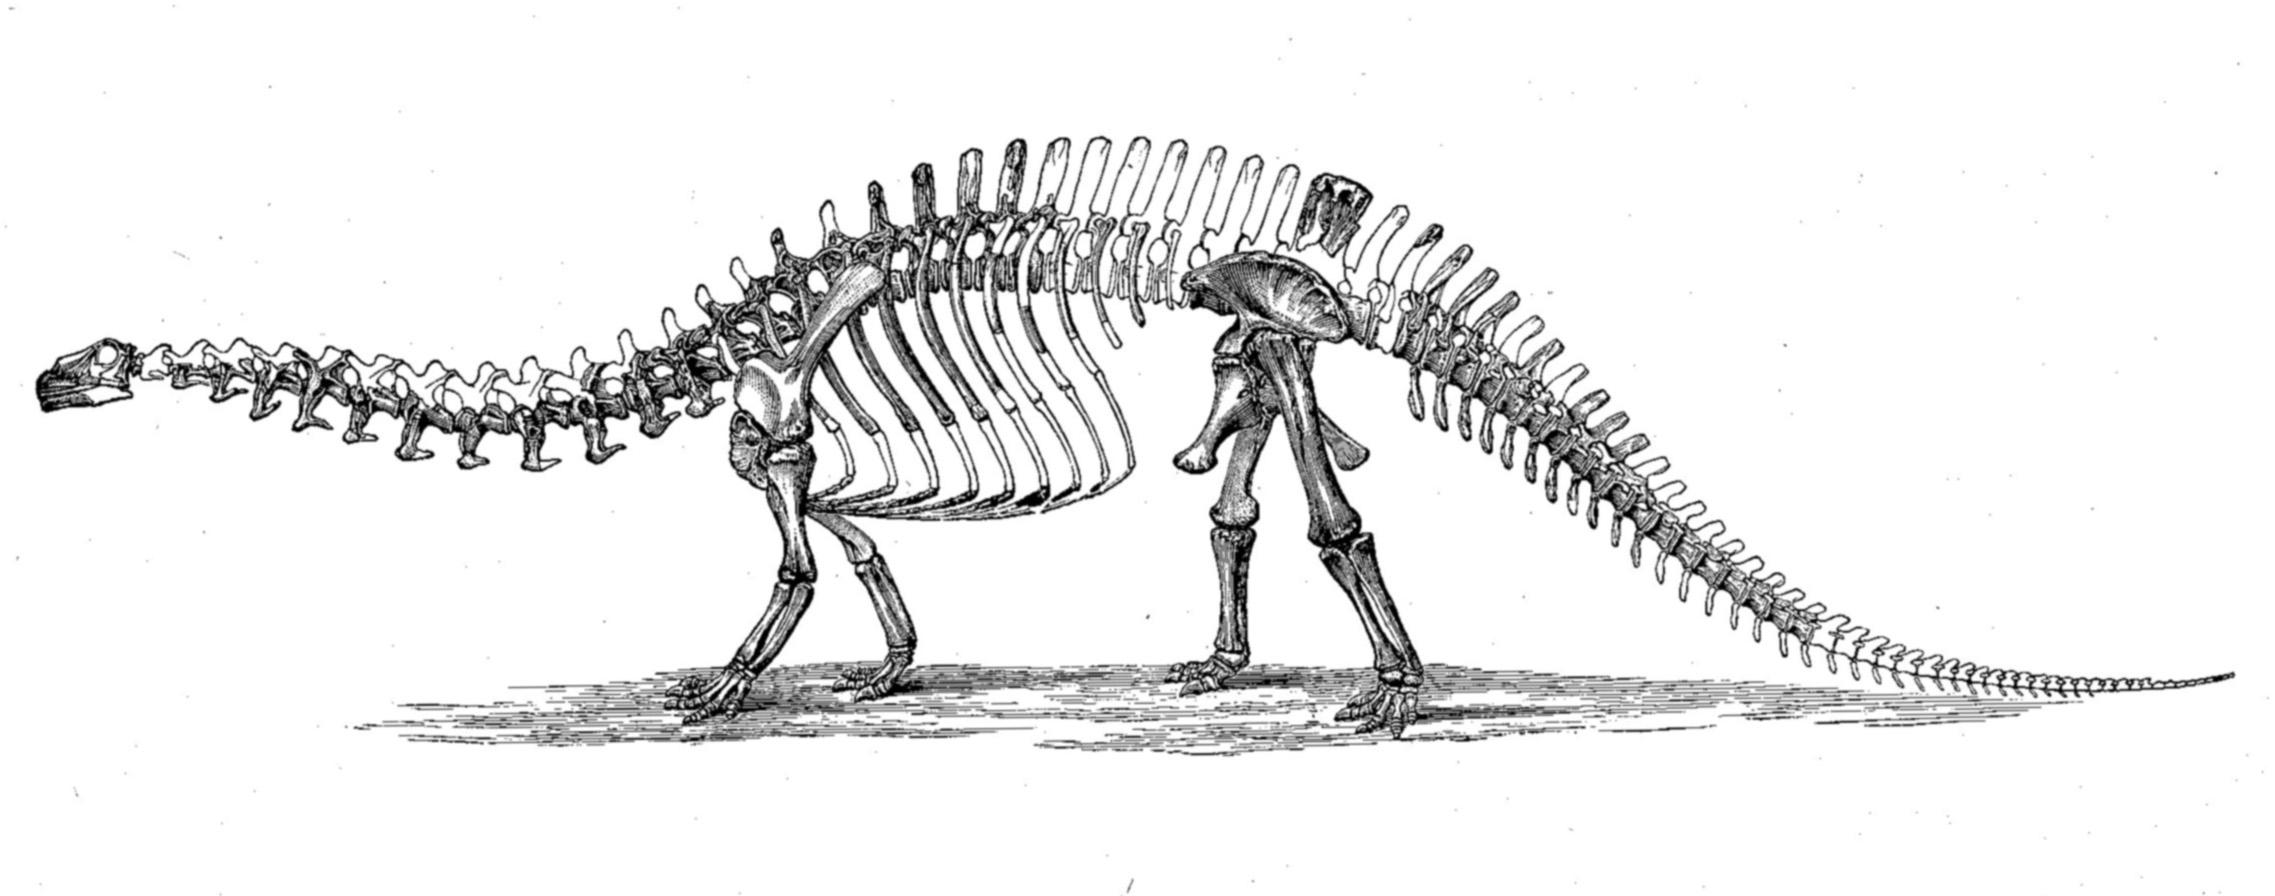 Brachiosaurus clipart blue dinosaur Jurassic Park Jurassic Meets Printing